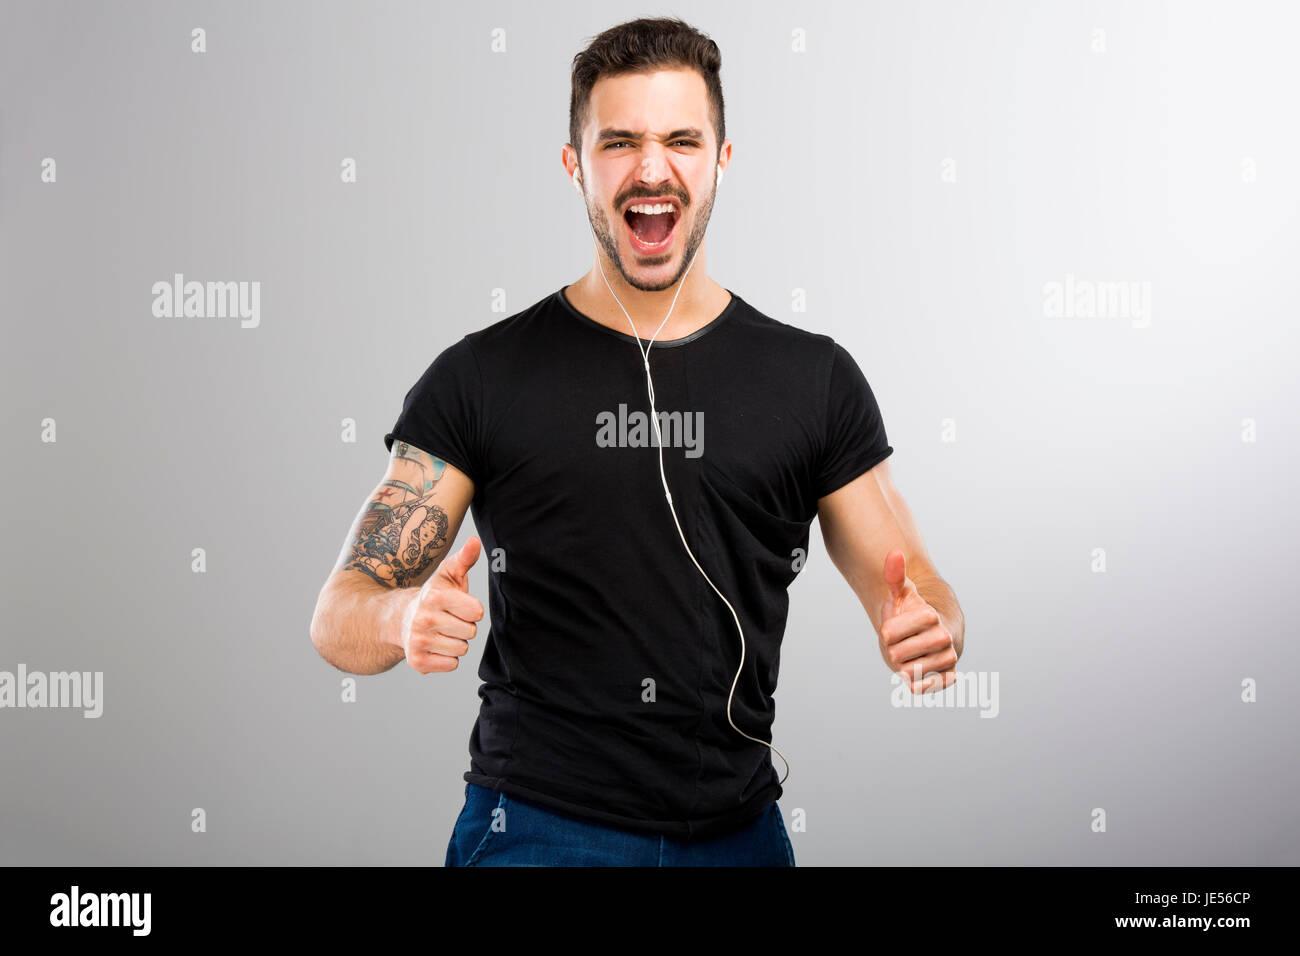 Latino muscle thumbs